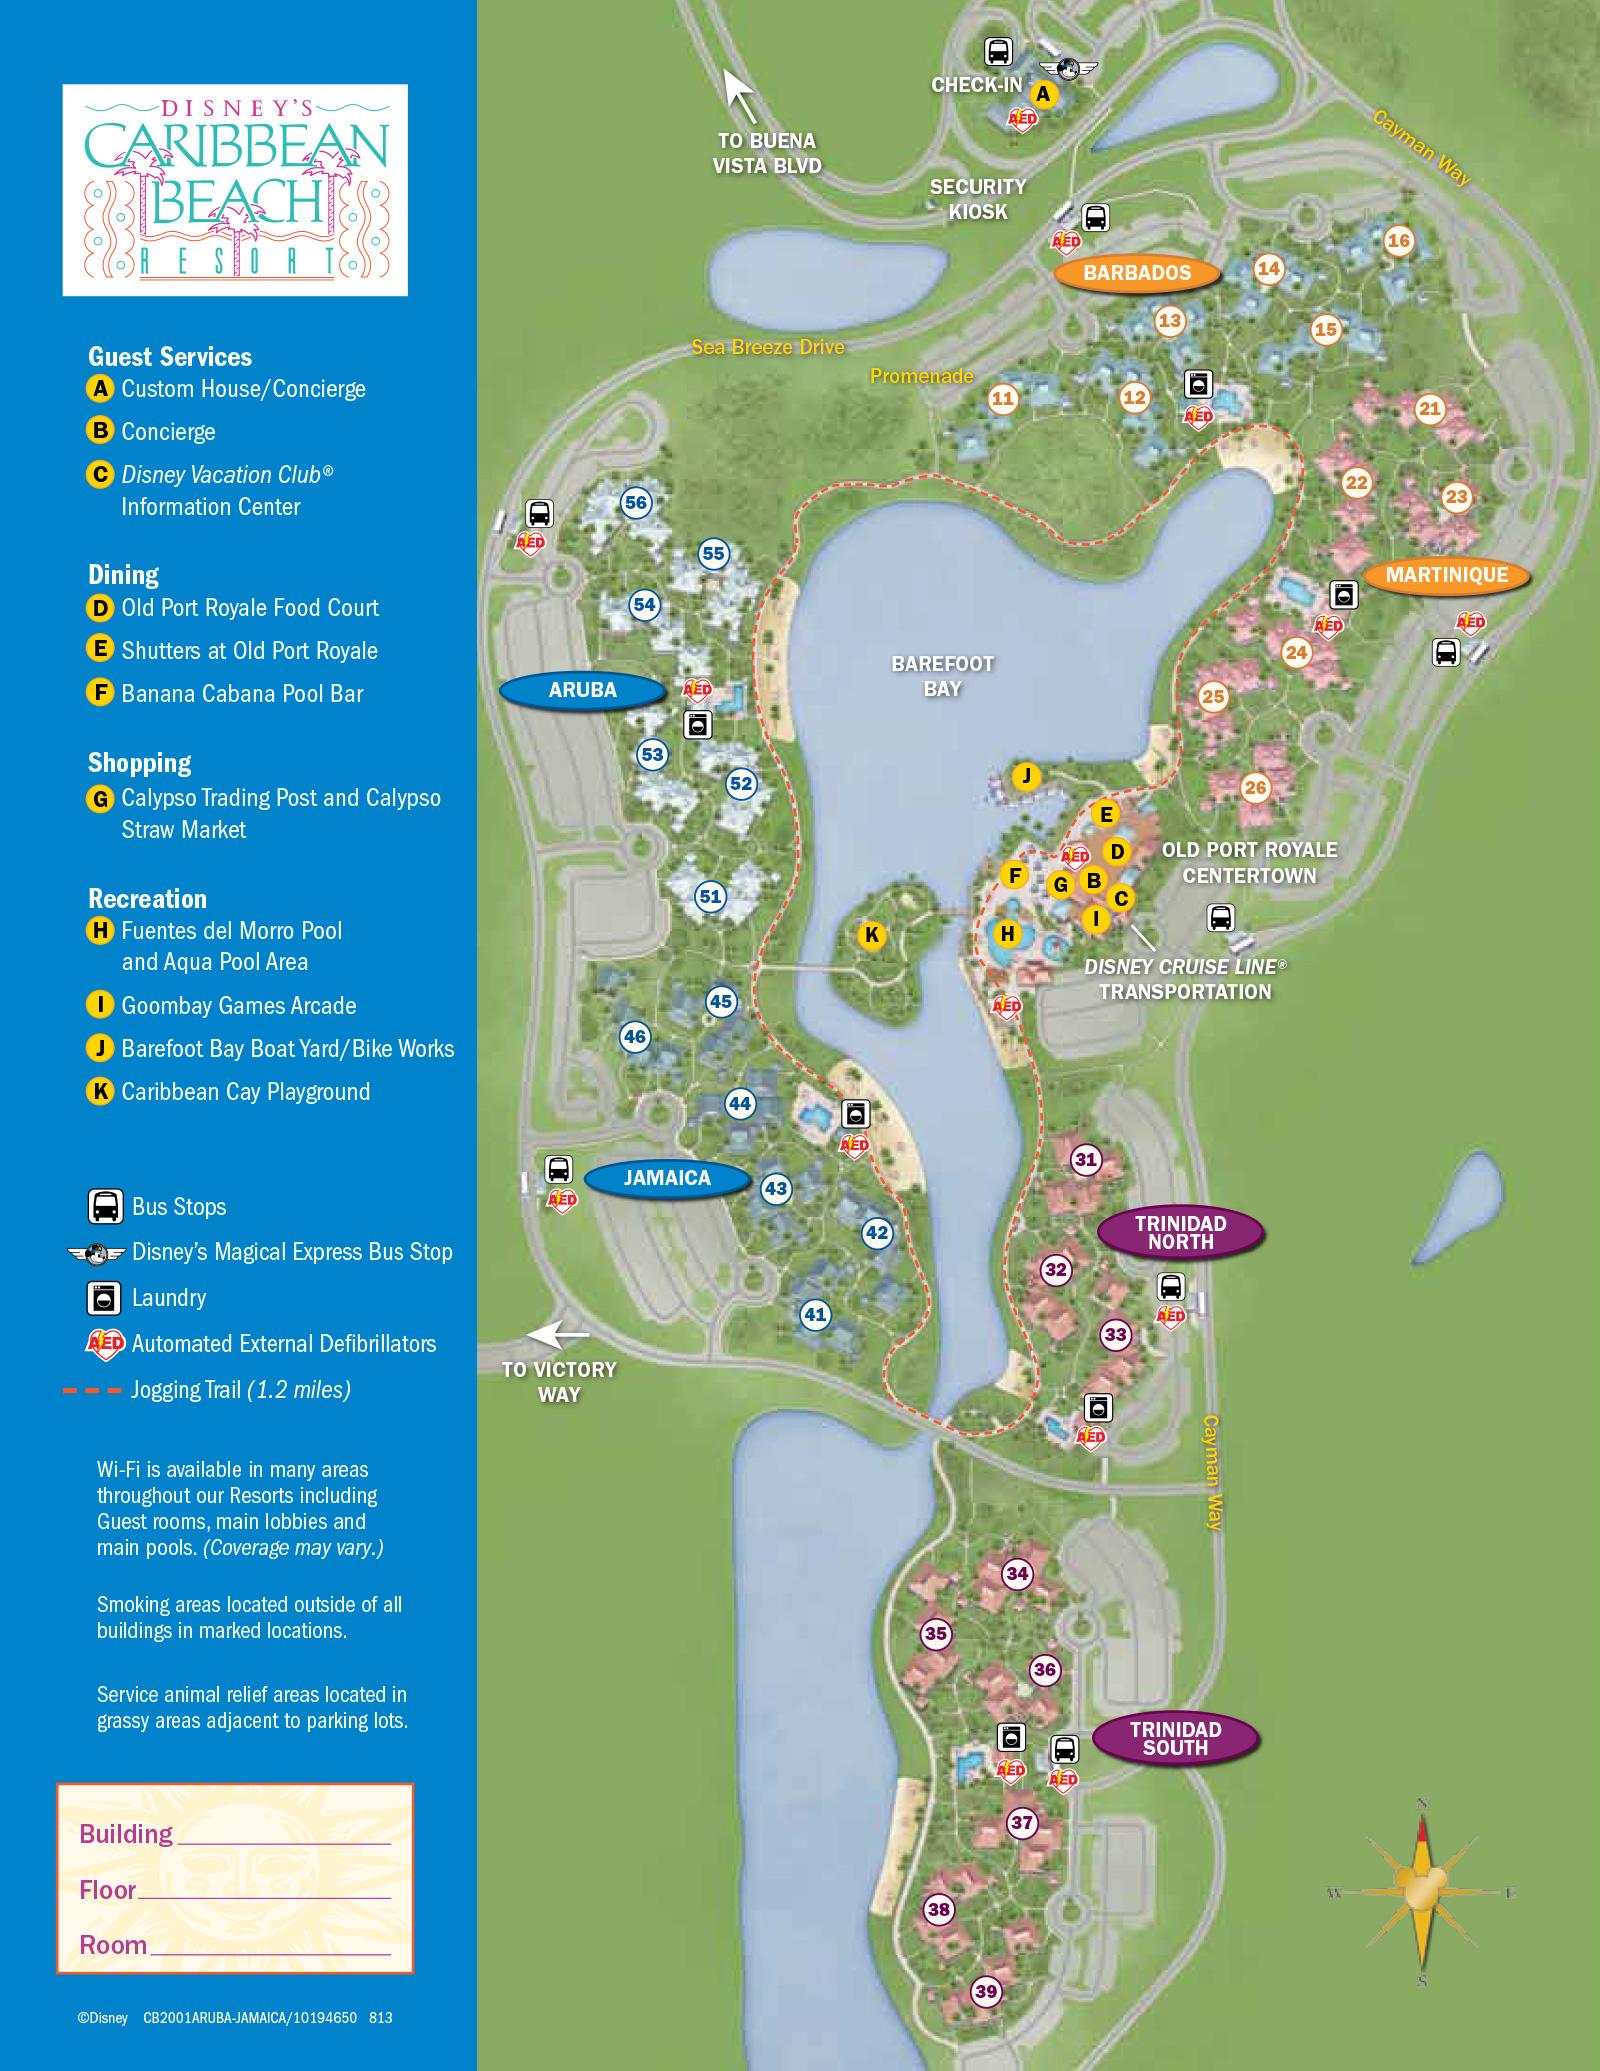 2013 Caribbean Beach Resort guide map - Photo 1 of 6